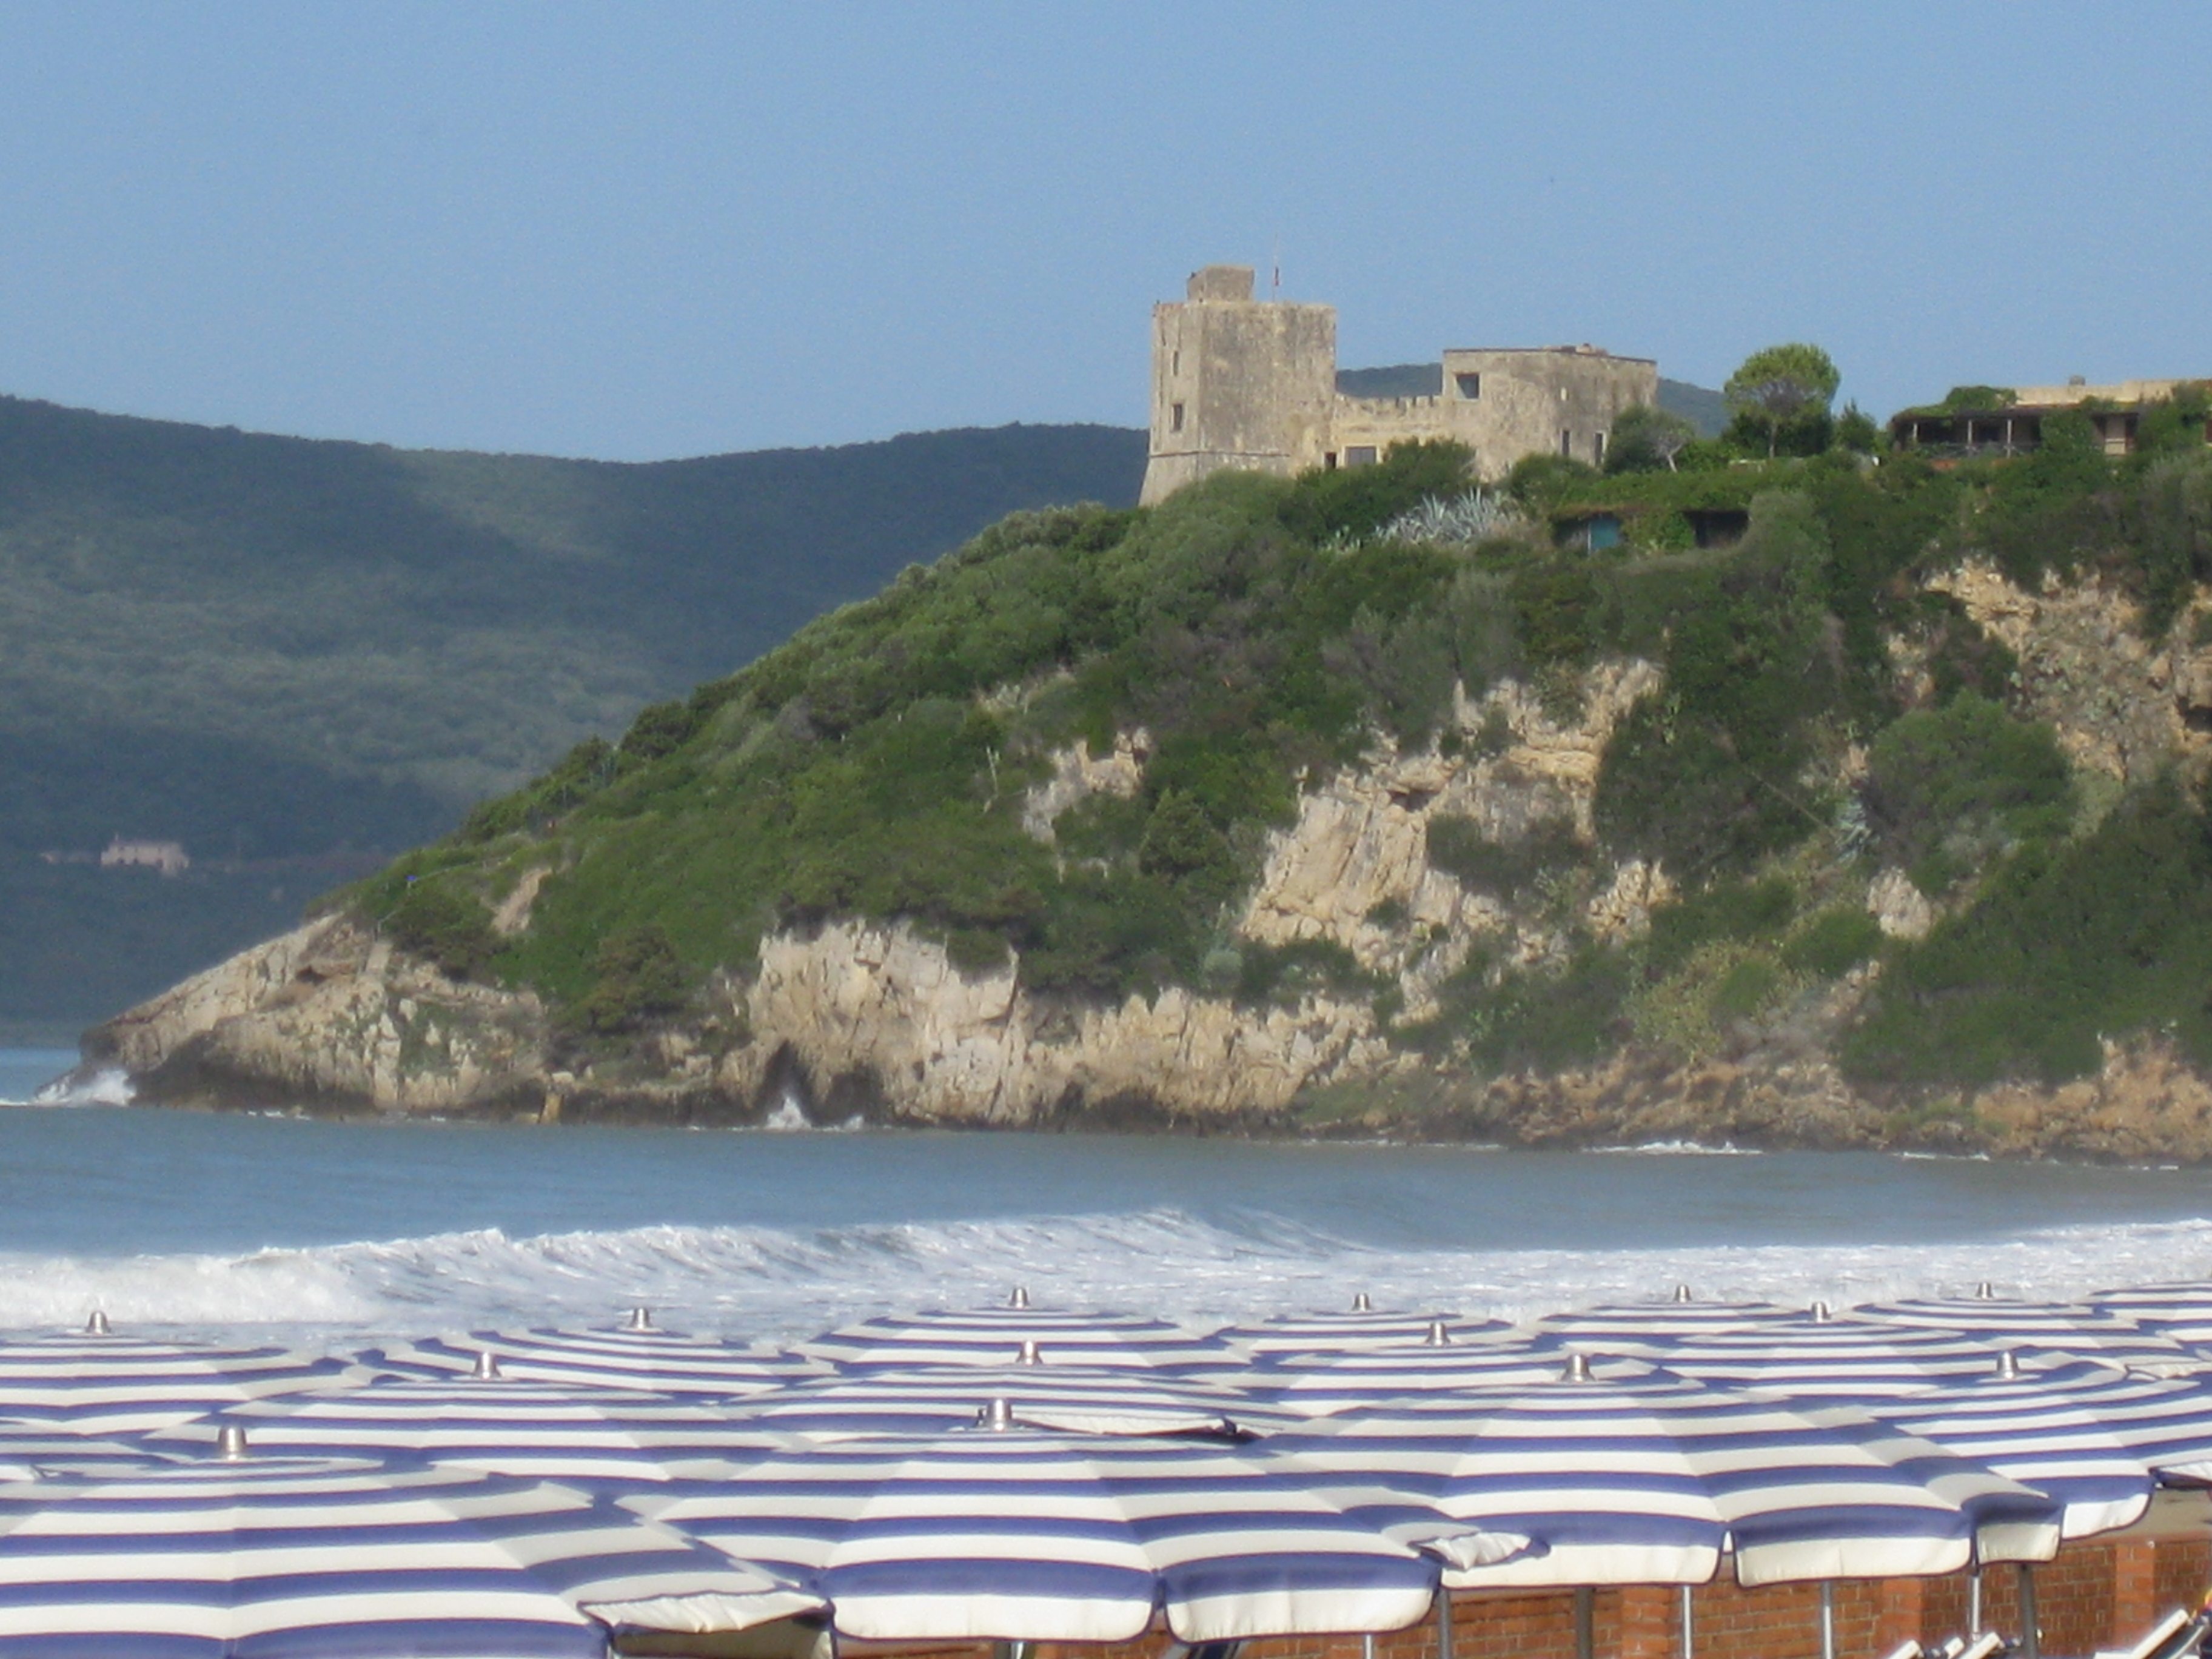 La torre di Talamonaccio vista da Fonteblanda